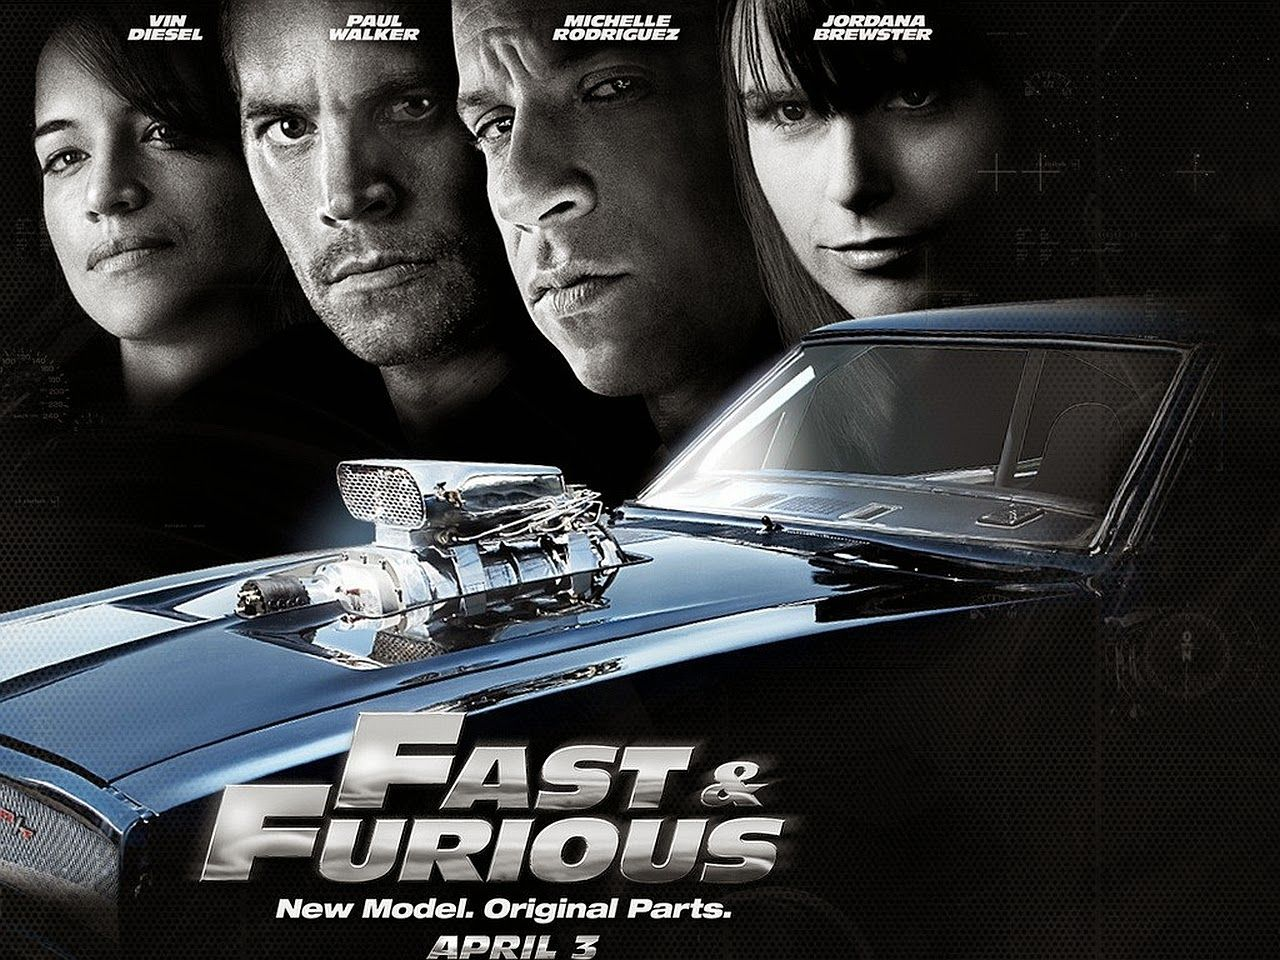 Fast And Furious 7 New Model KINJENK DESKTOP WALLPAPER